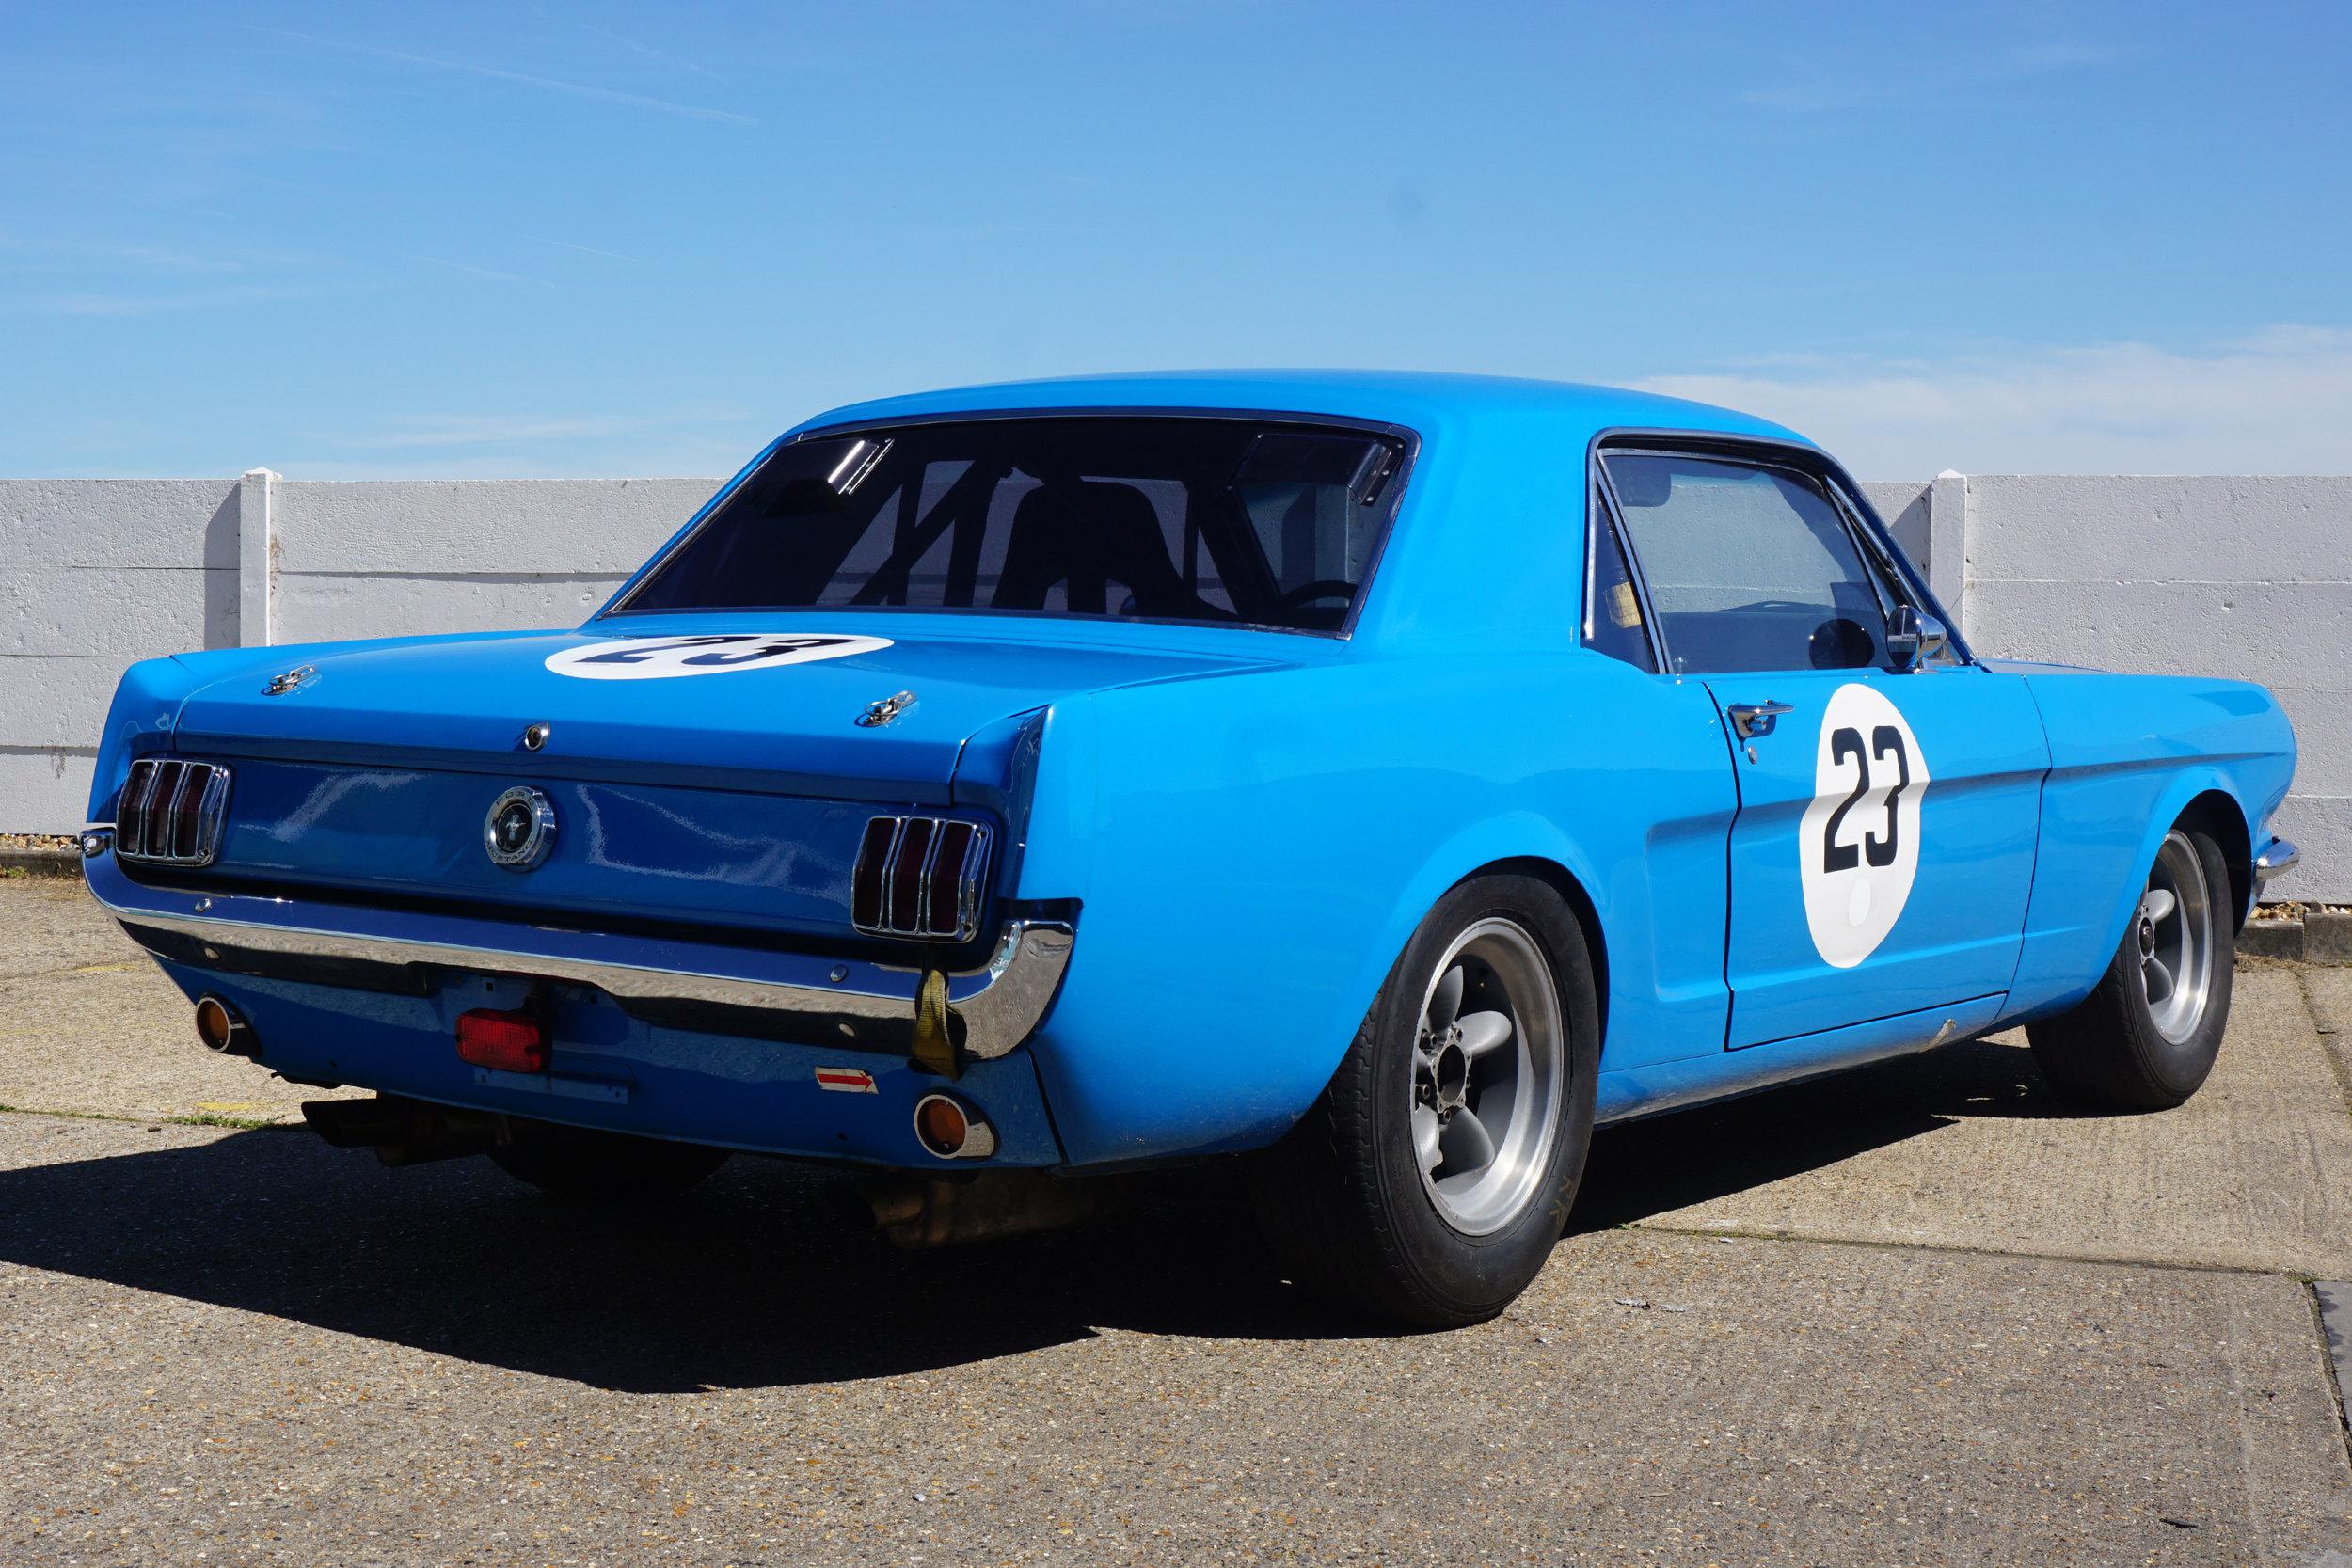 Blue-Mustang-03.jpg